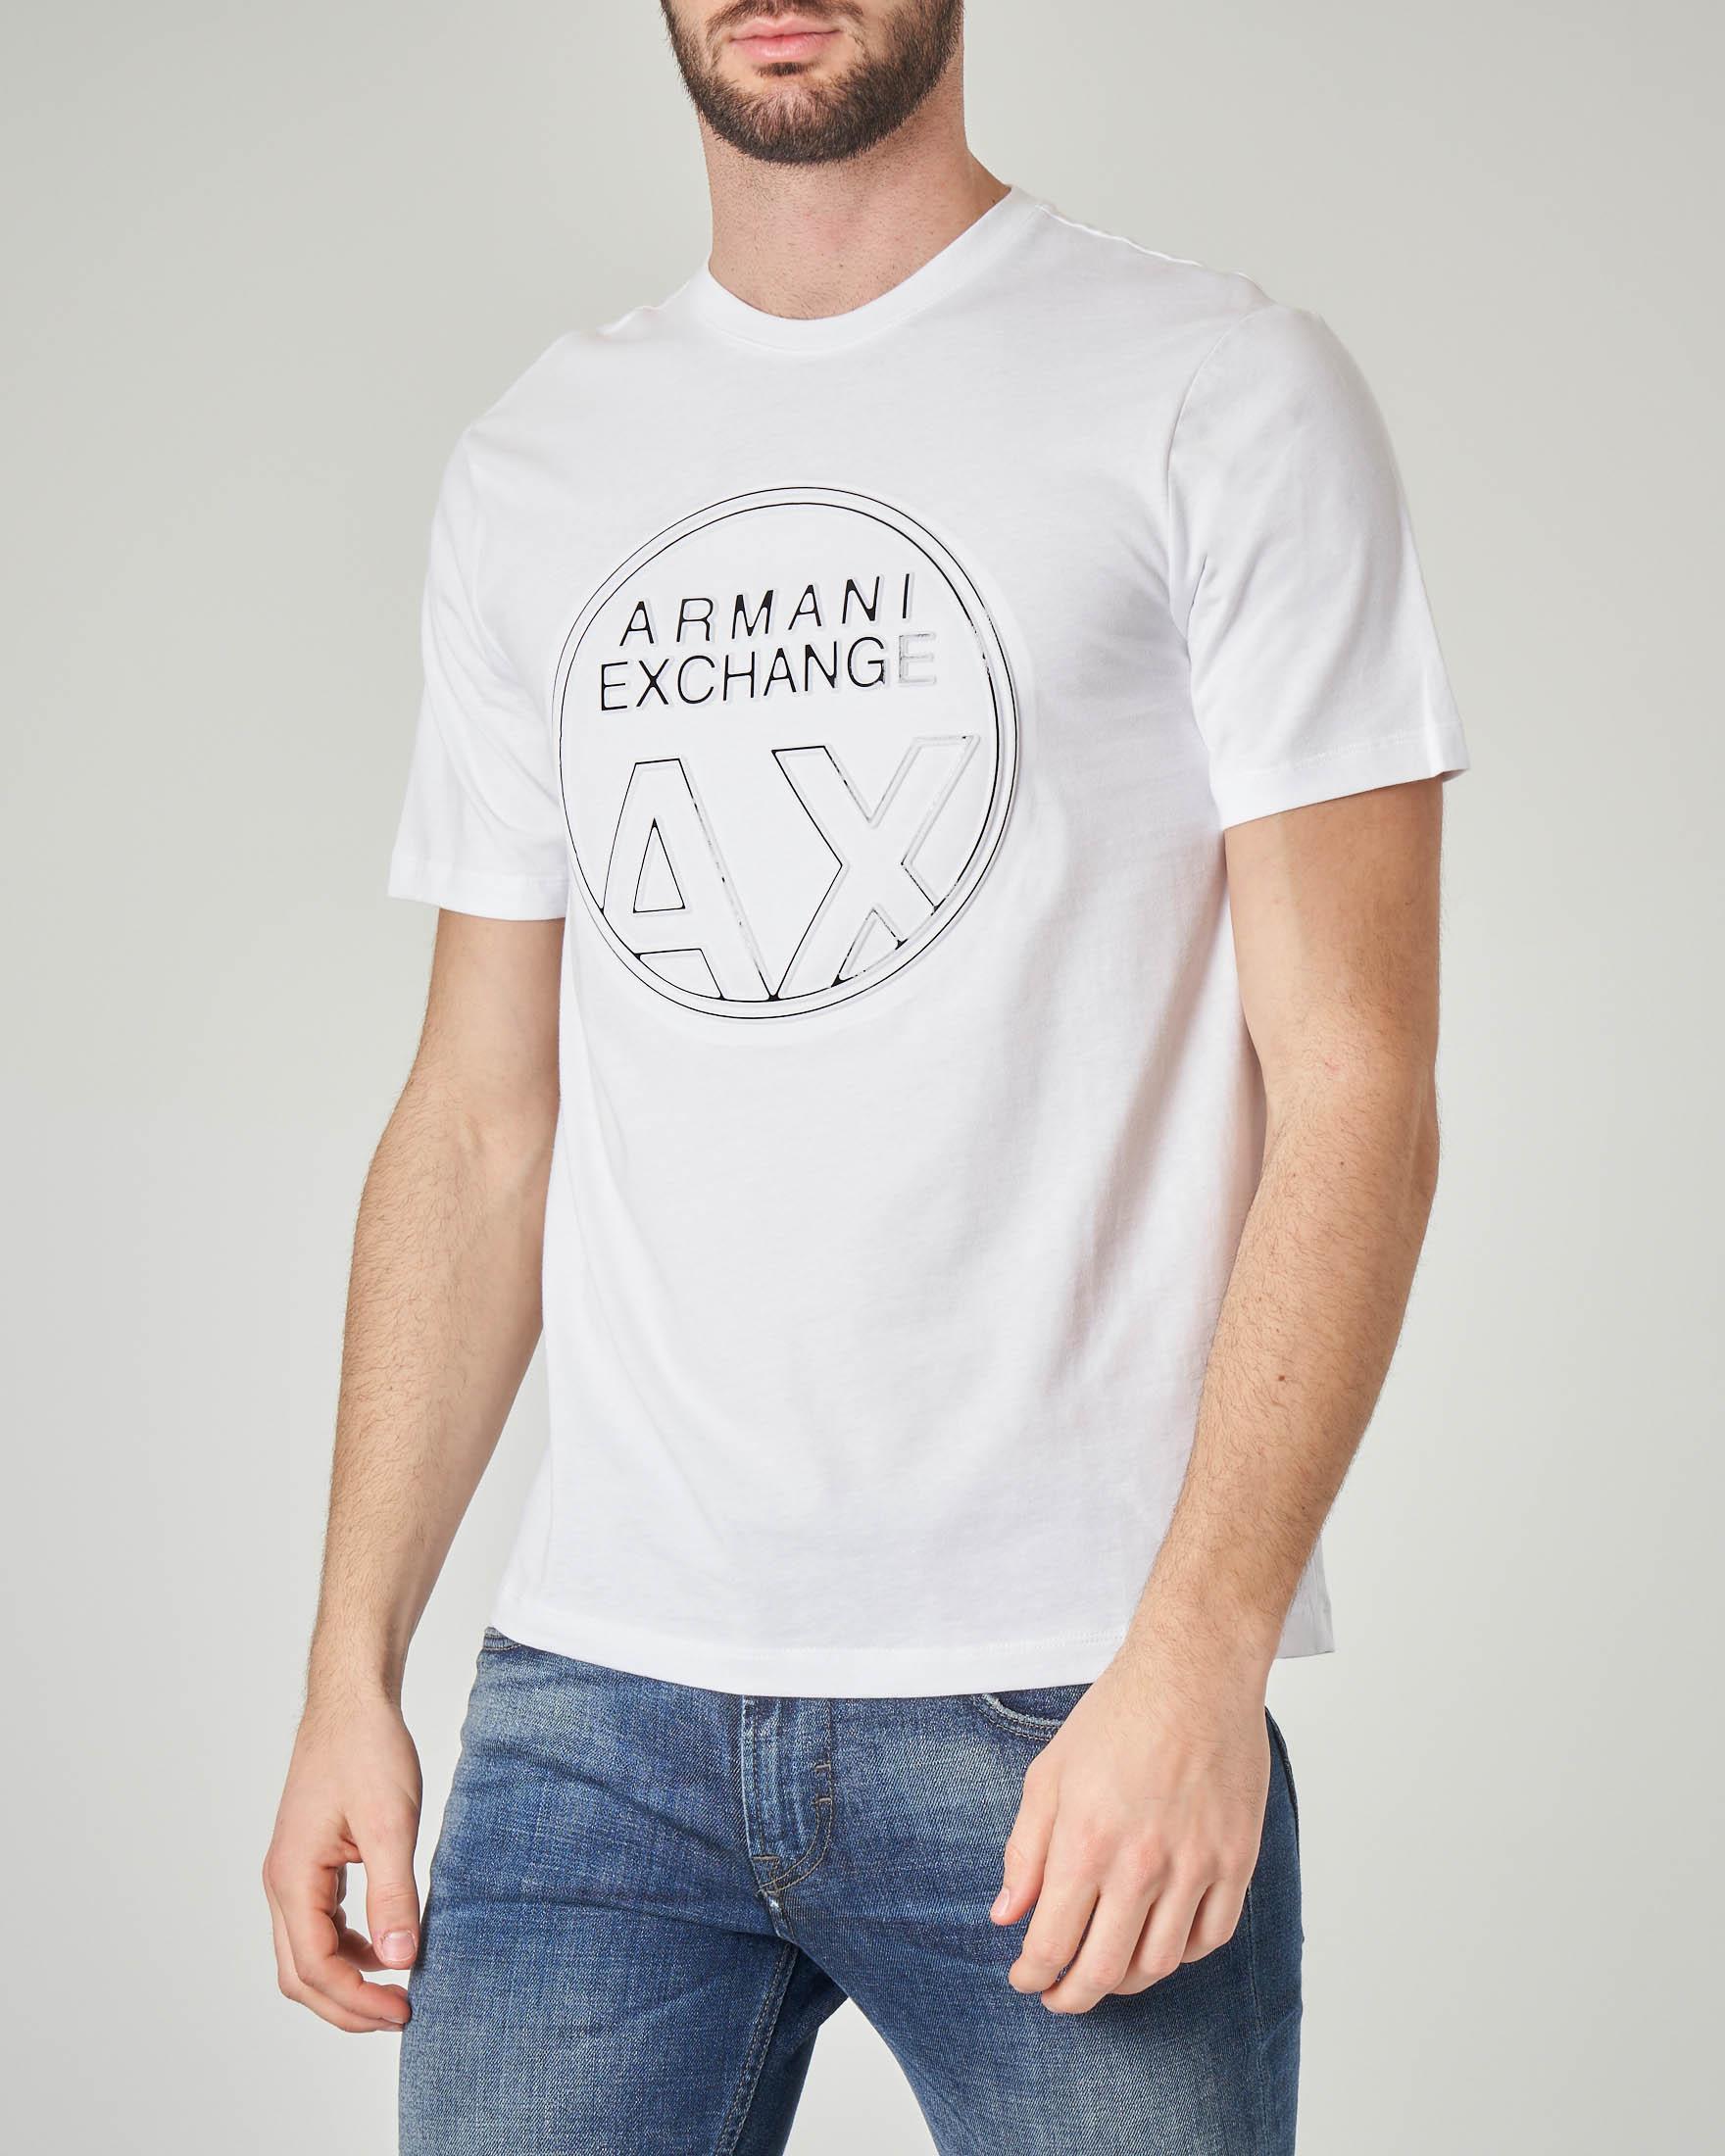 T-shirt bianca con logo bollo in rilievo